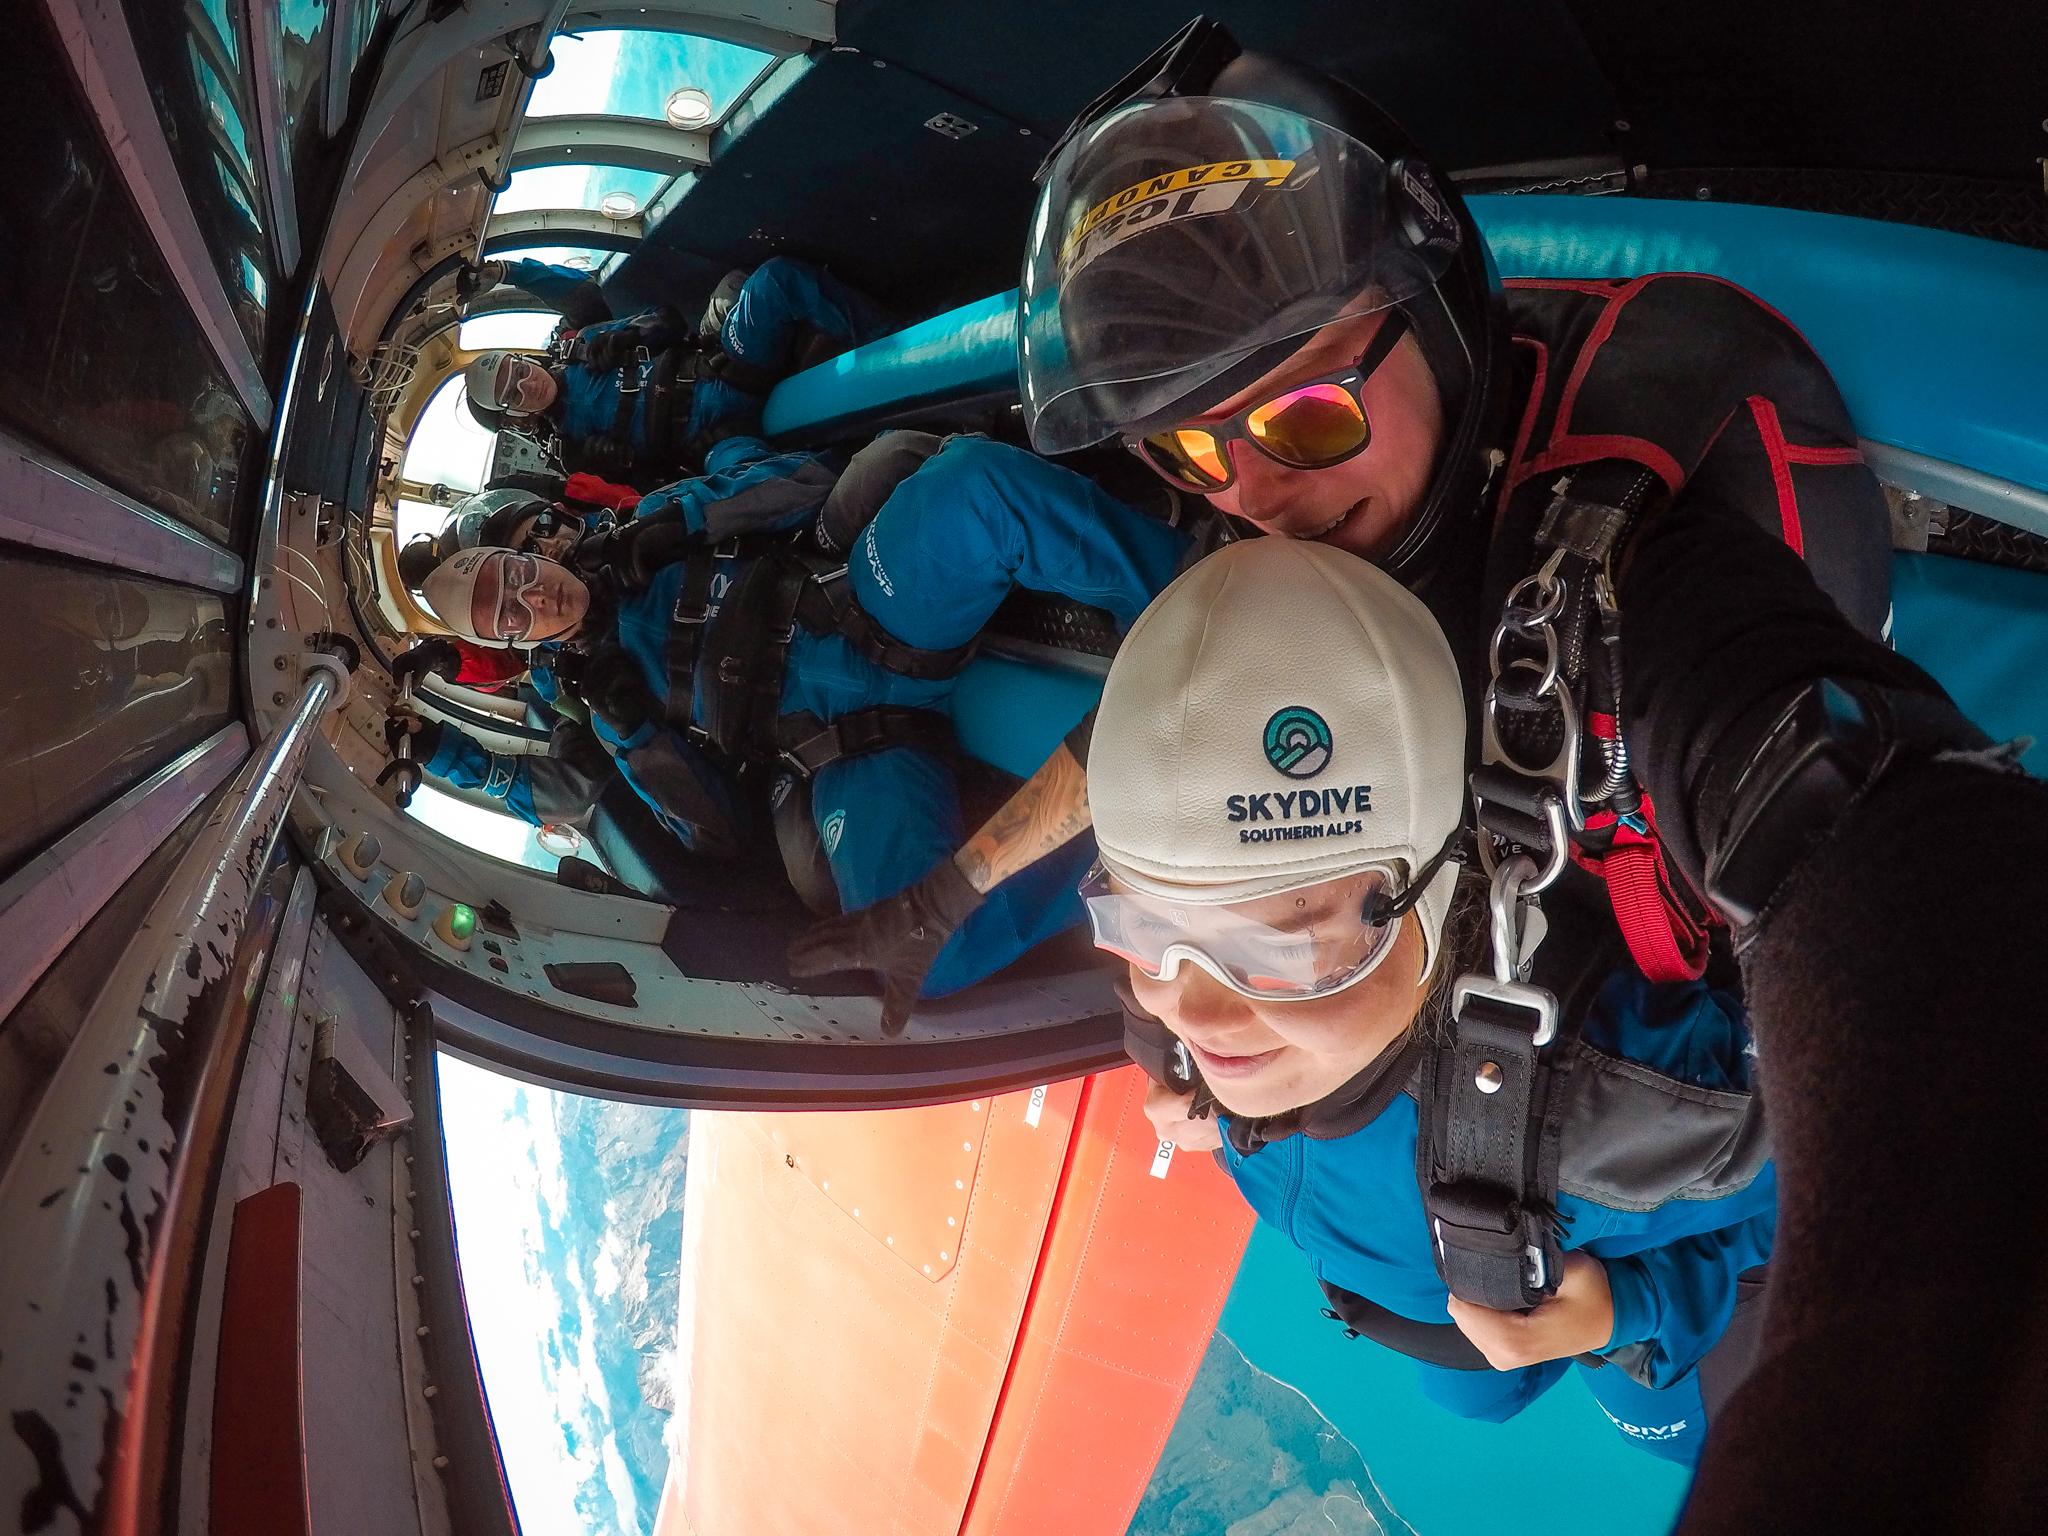 Skydiva southern alps-2